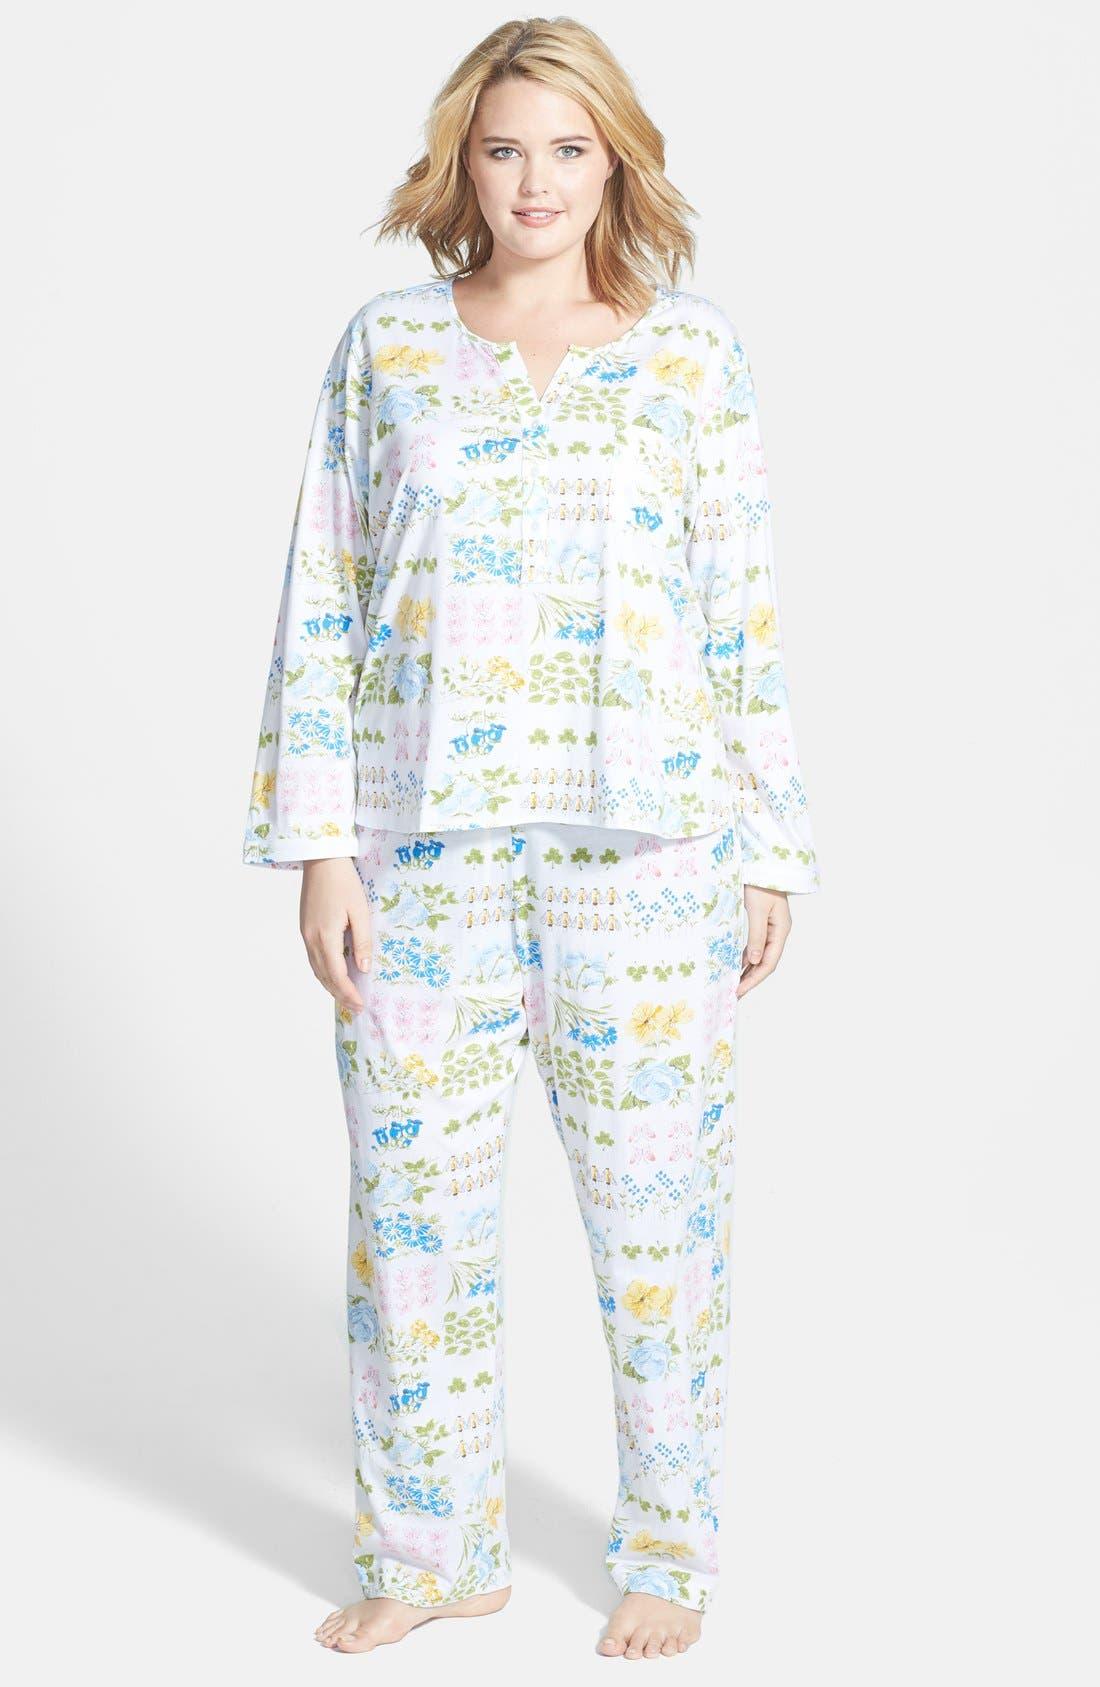 Alternate Image 1 Selected - Carole Hochman Designs 'Butterfly Garden' Pajamas (Plus Size)